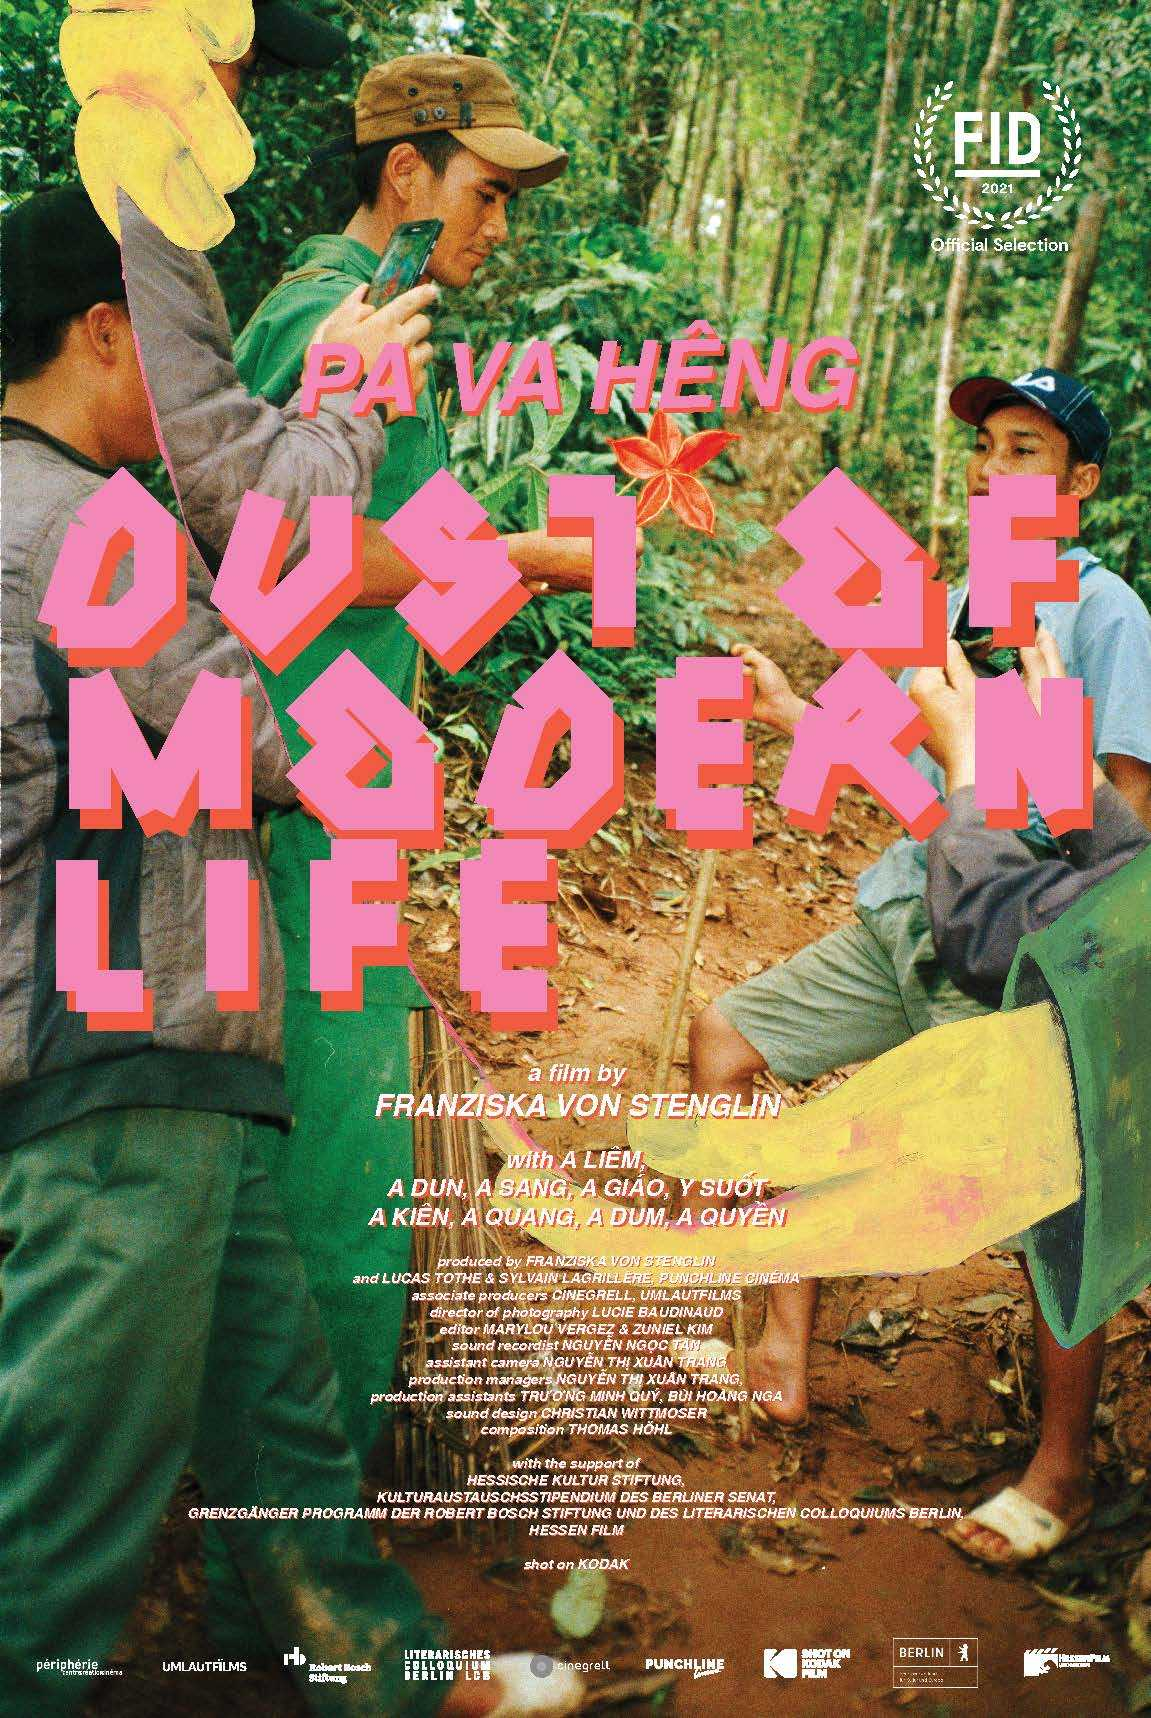 Pa Va Hêng, Dust of Modern Life film poster